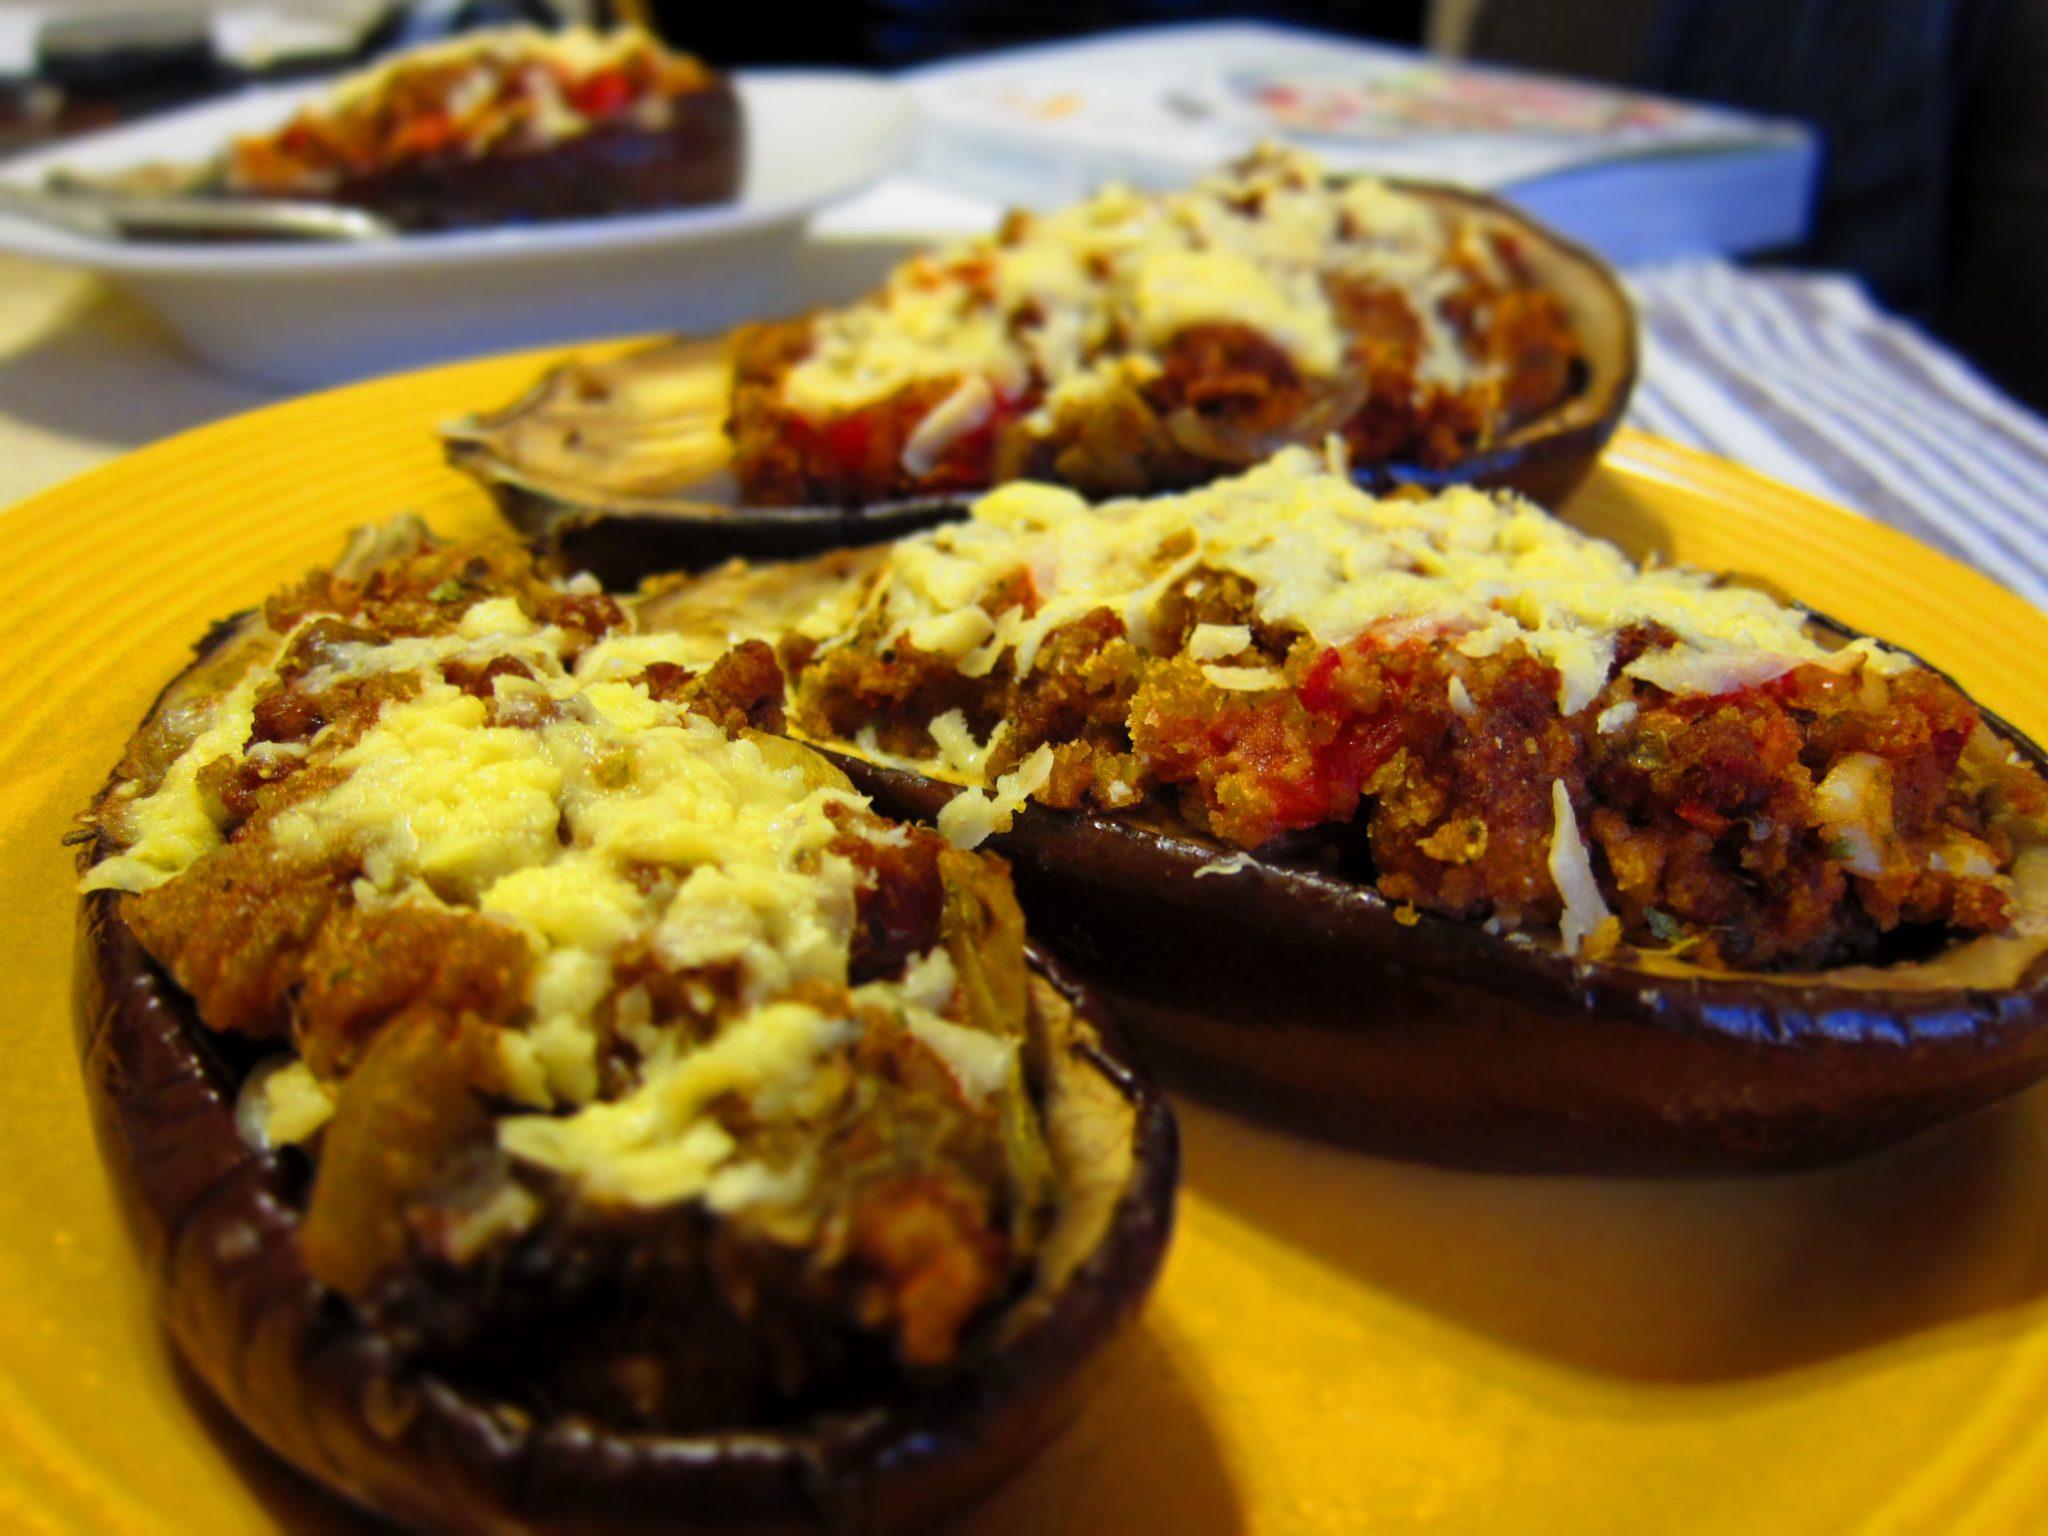 ... sausage stuffed sausage stuffed eggplant sausage and eggplant stuffed